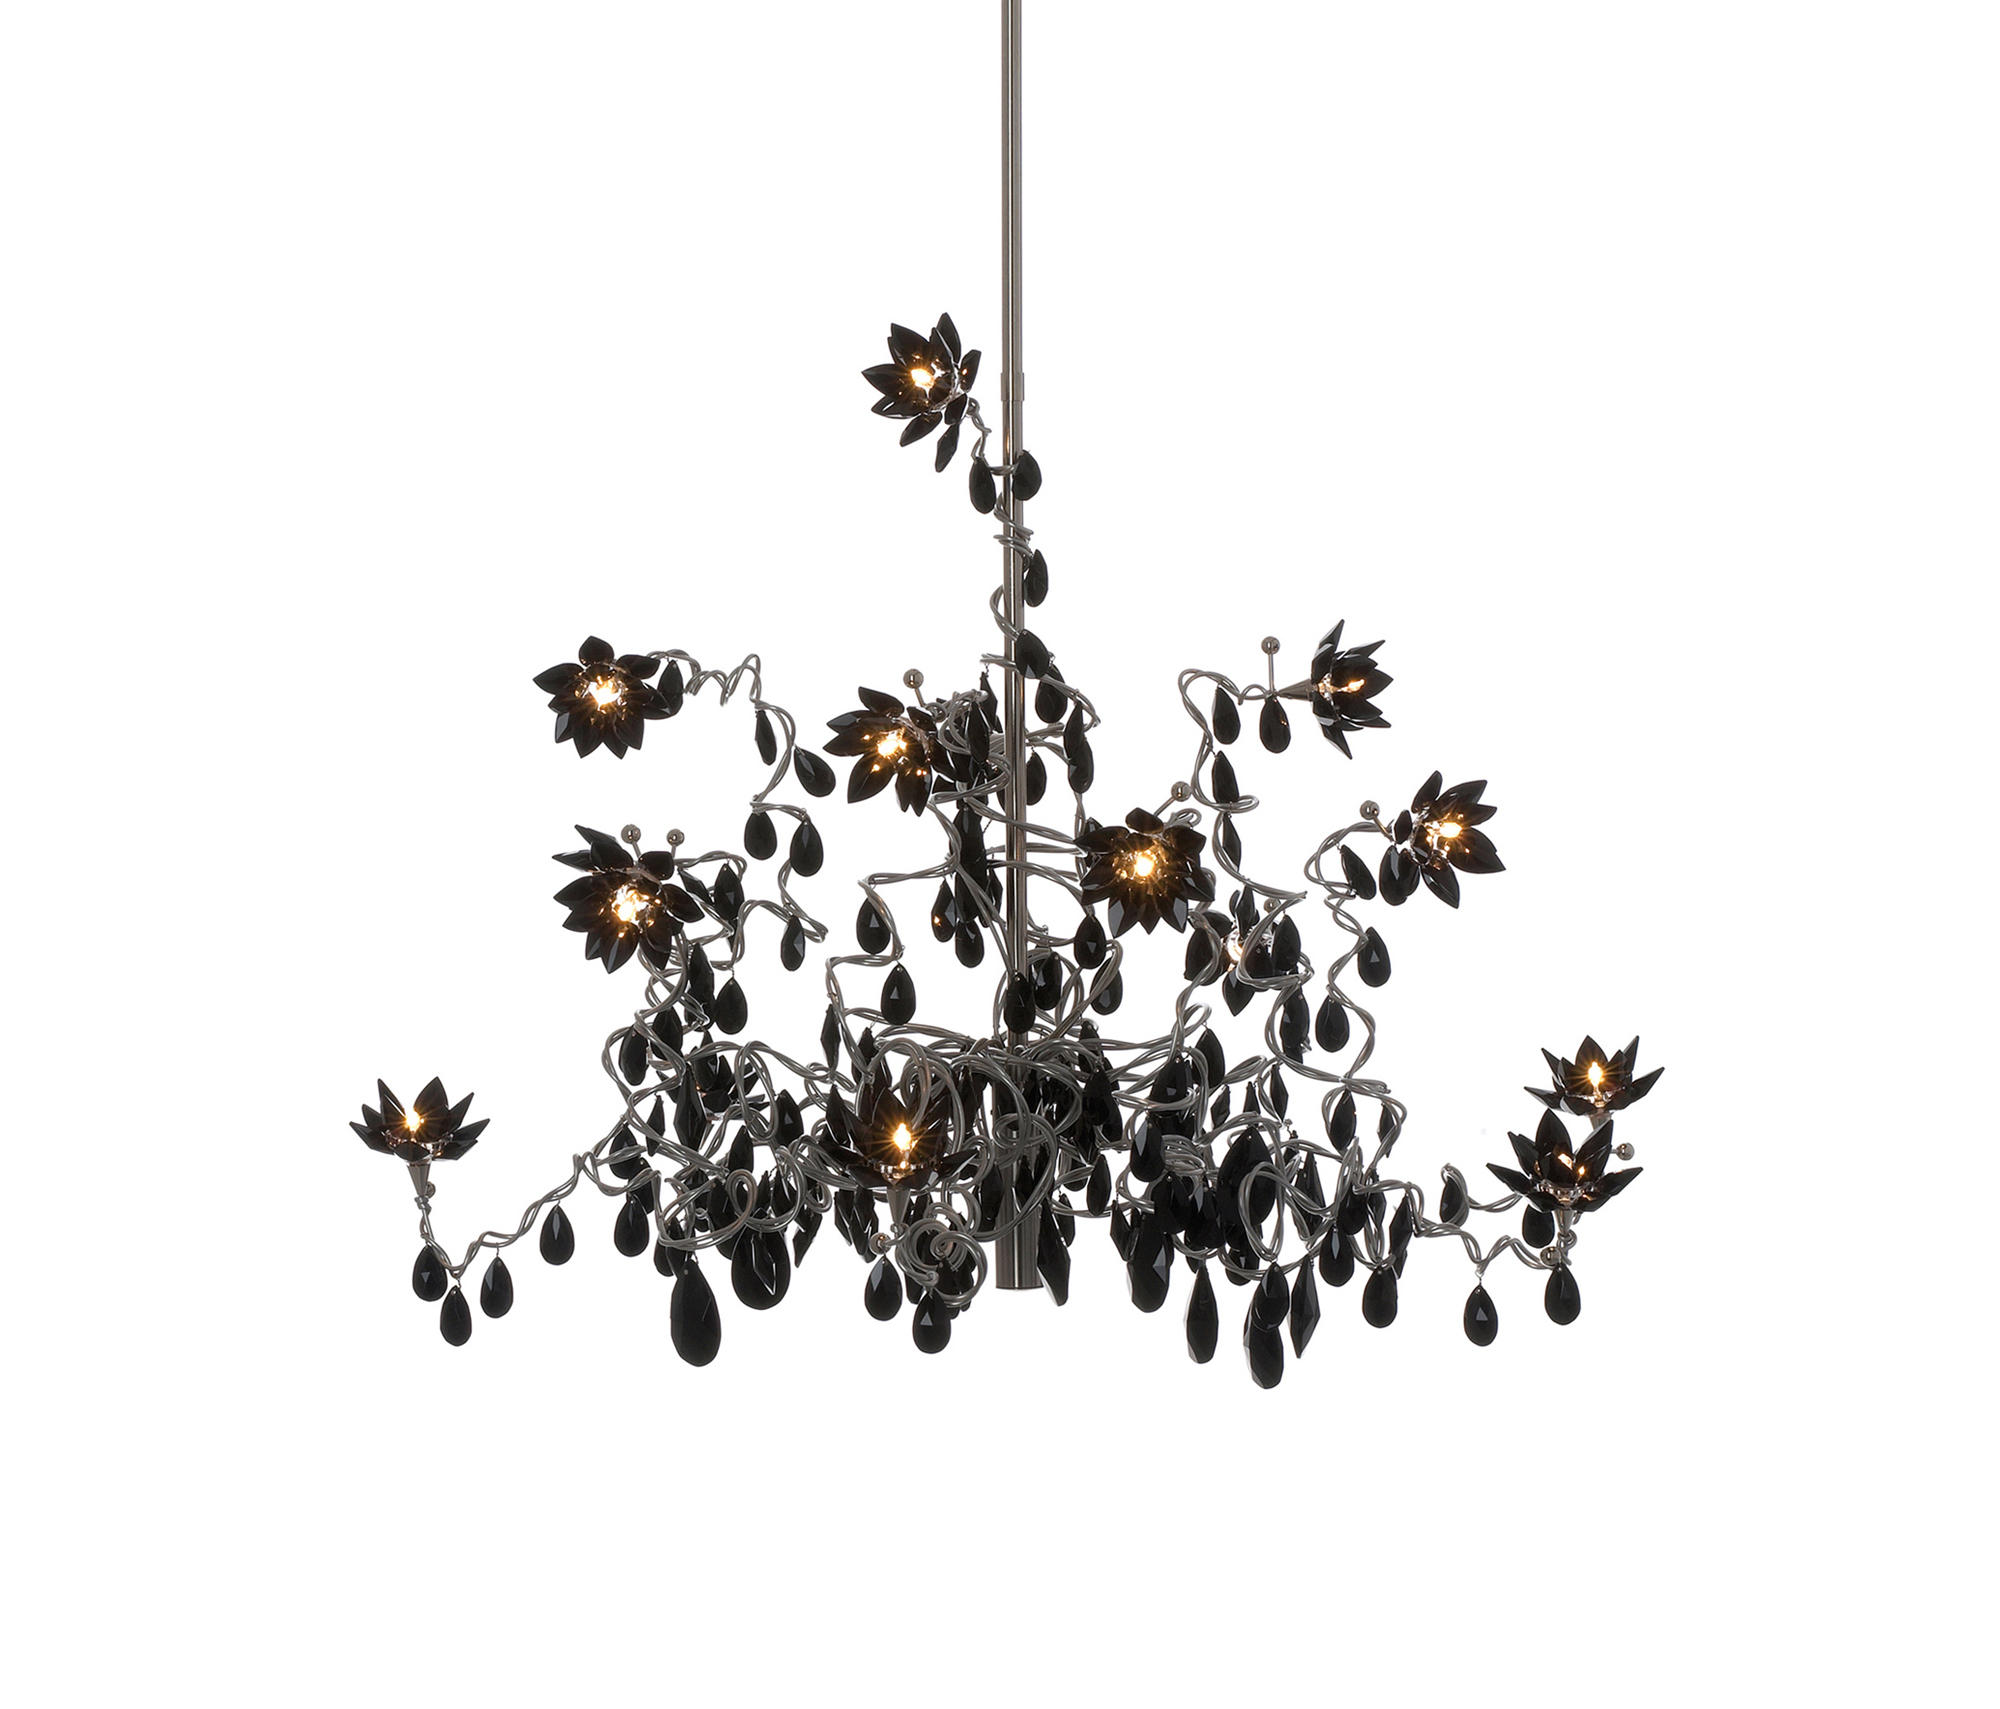 Jewel Chandelier Pendant Light 12 Black Suspended Lights From